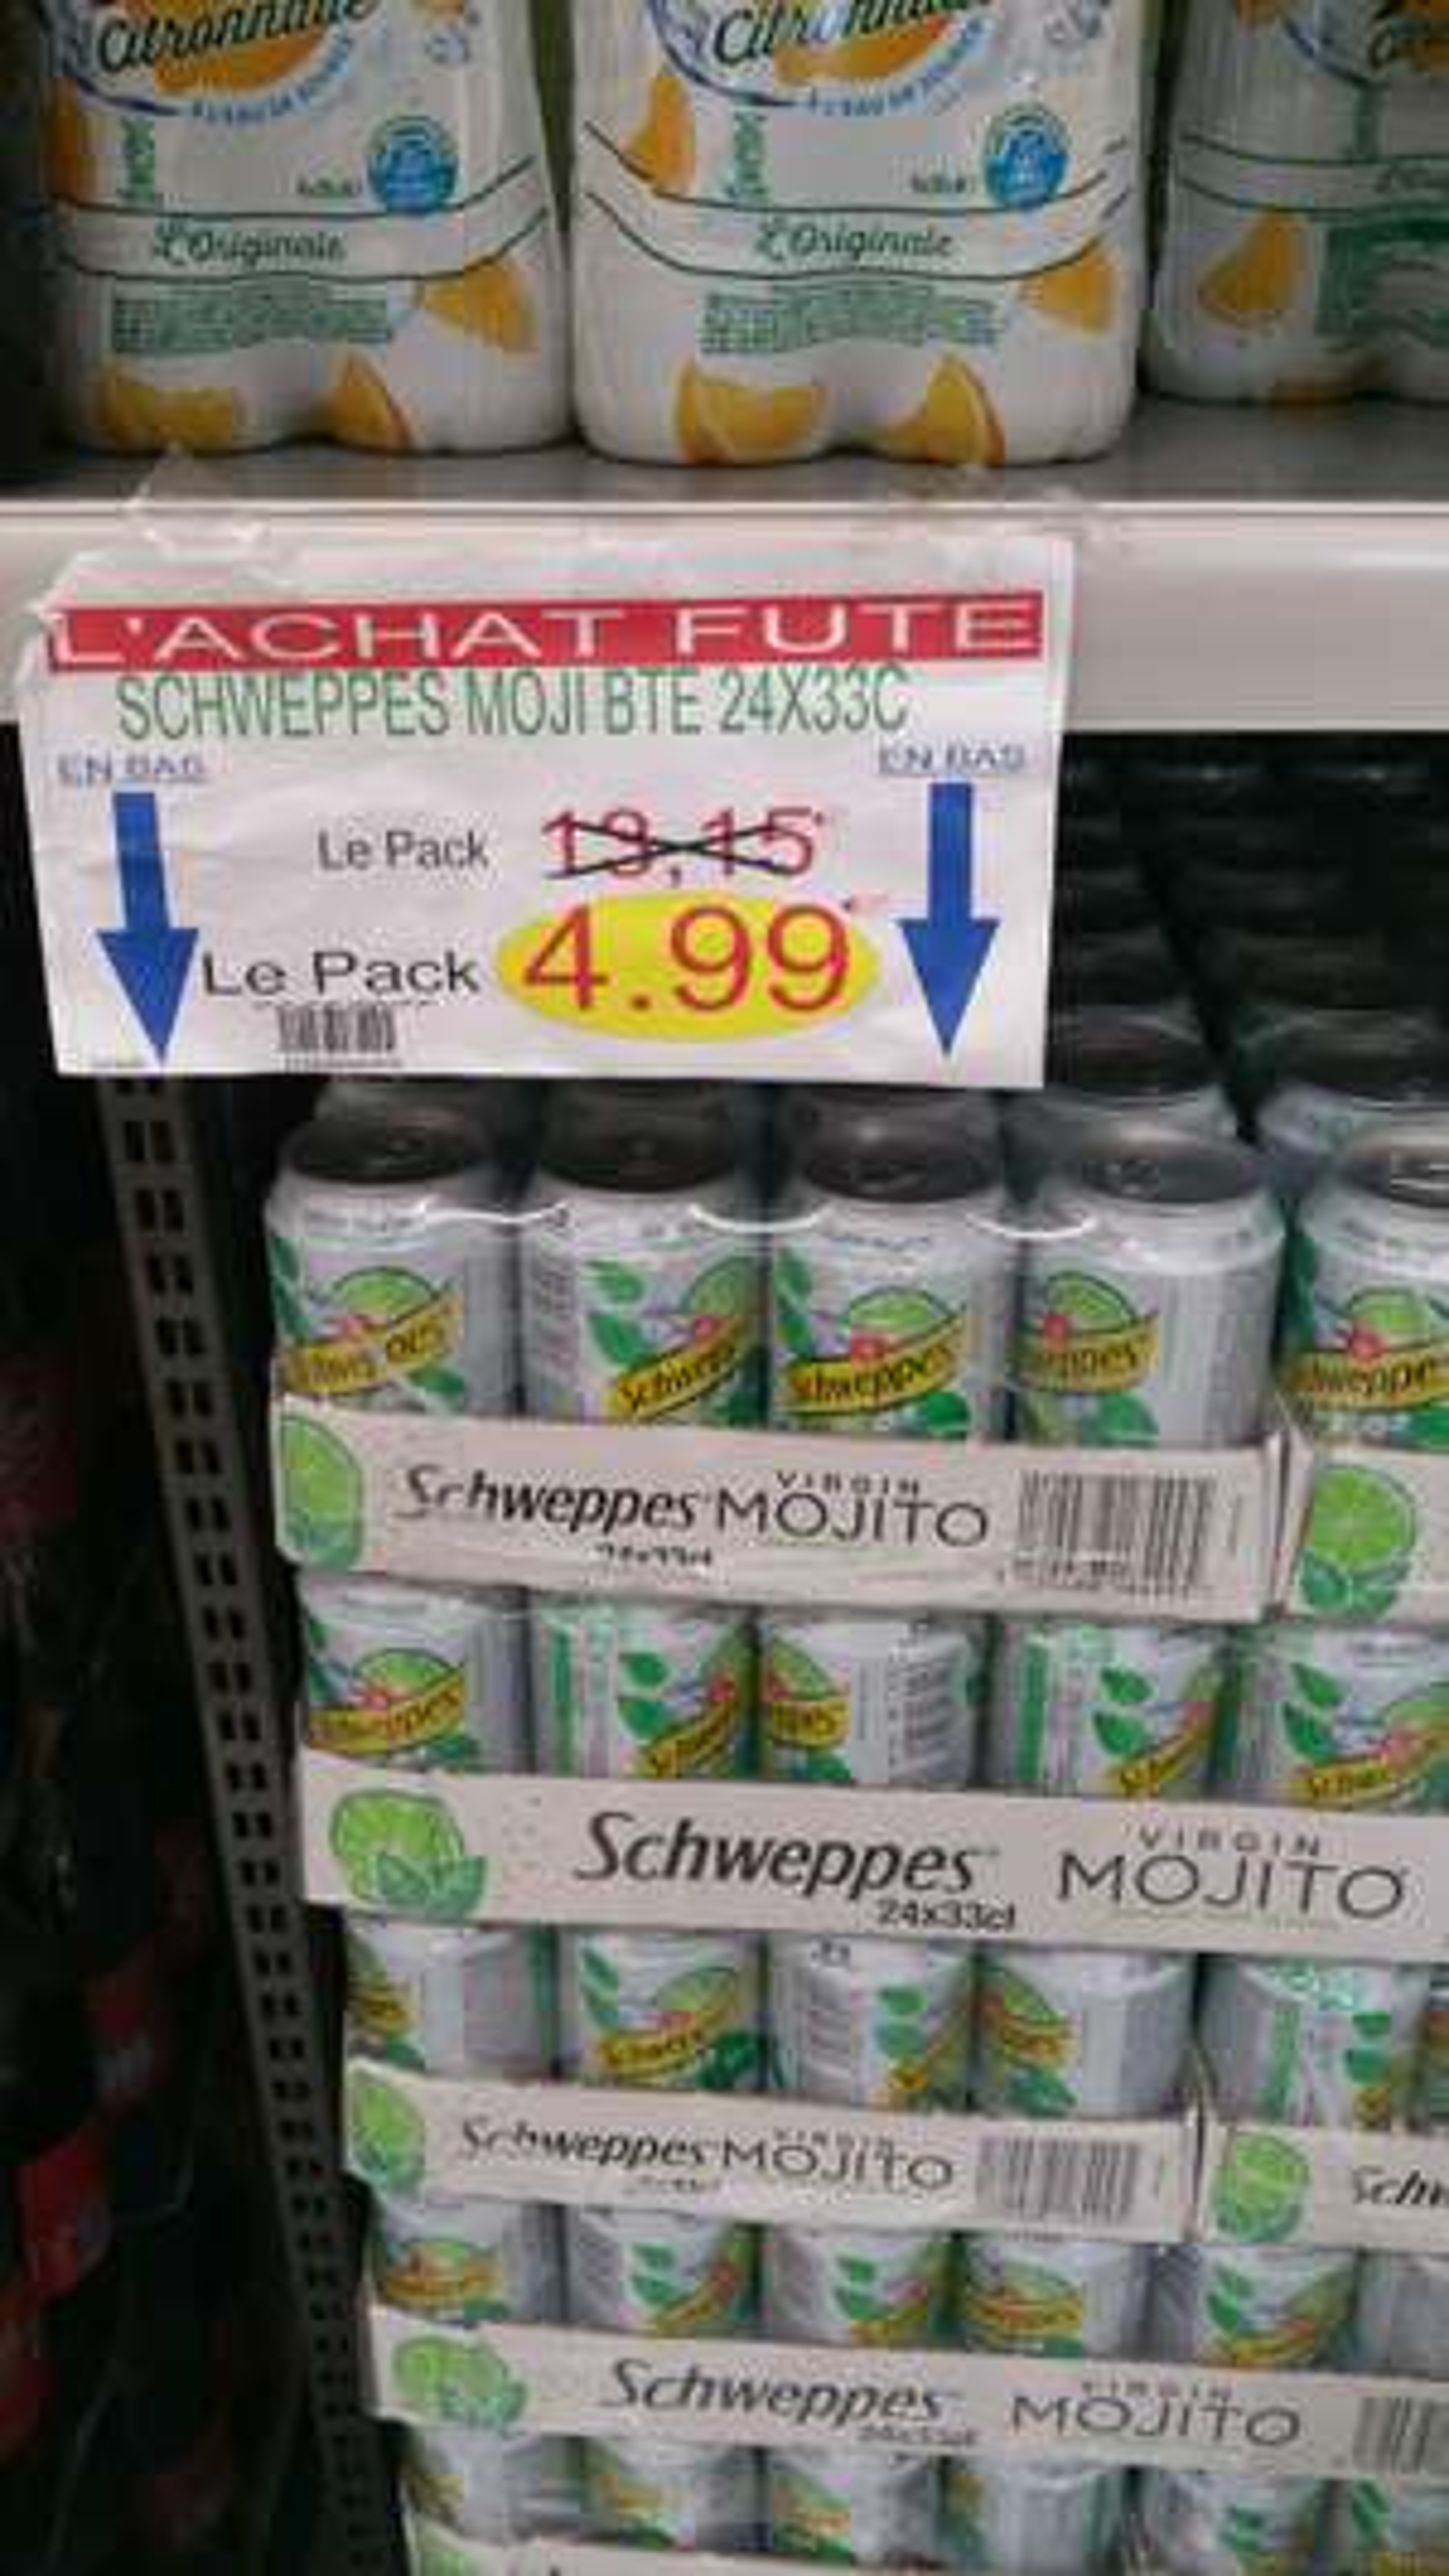 Lot de 24 canettes de soda Schweppes Virgin Mojito (33 cl)  - O'Marché Frais Argenteuil (95)